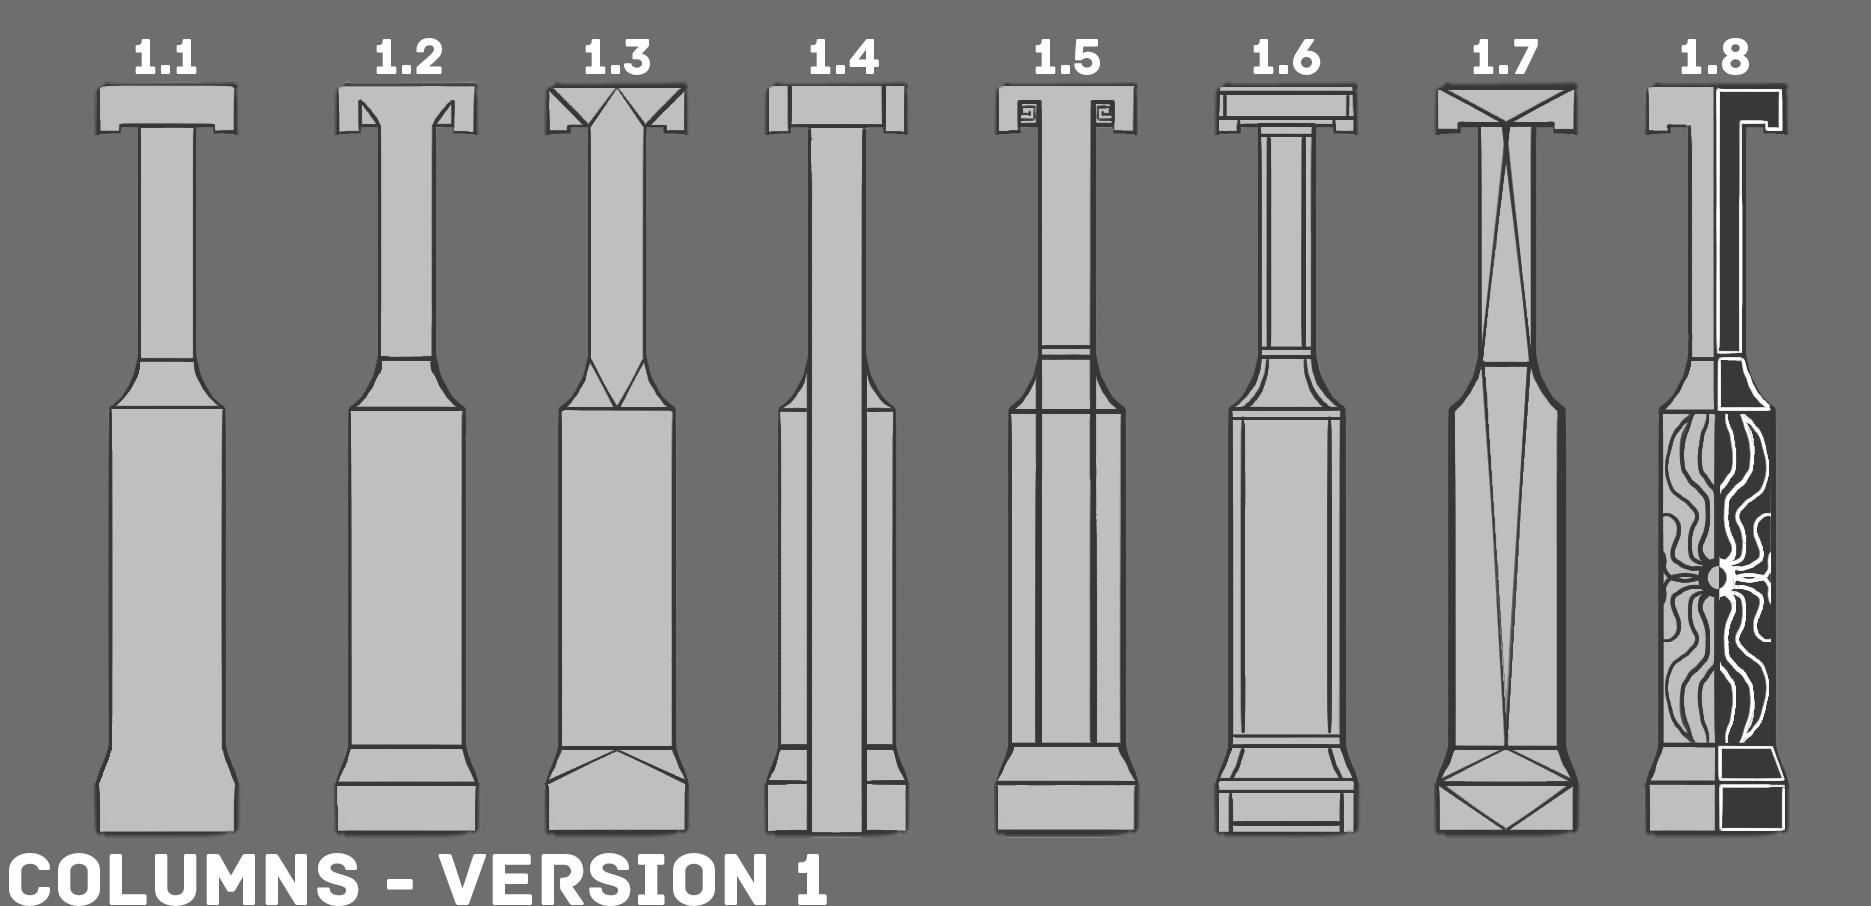 2a ED1 Column Sketches V1